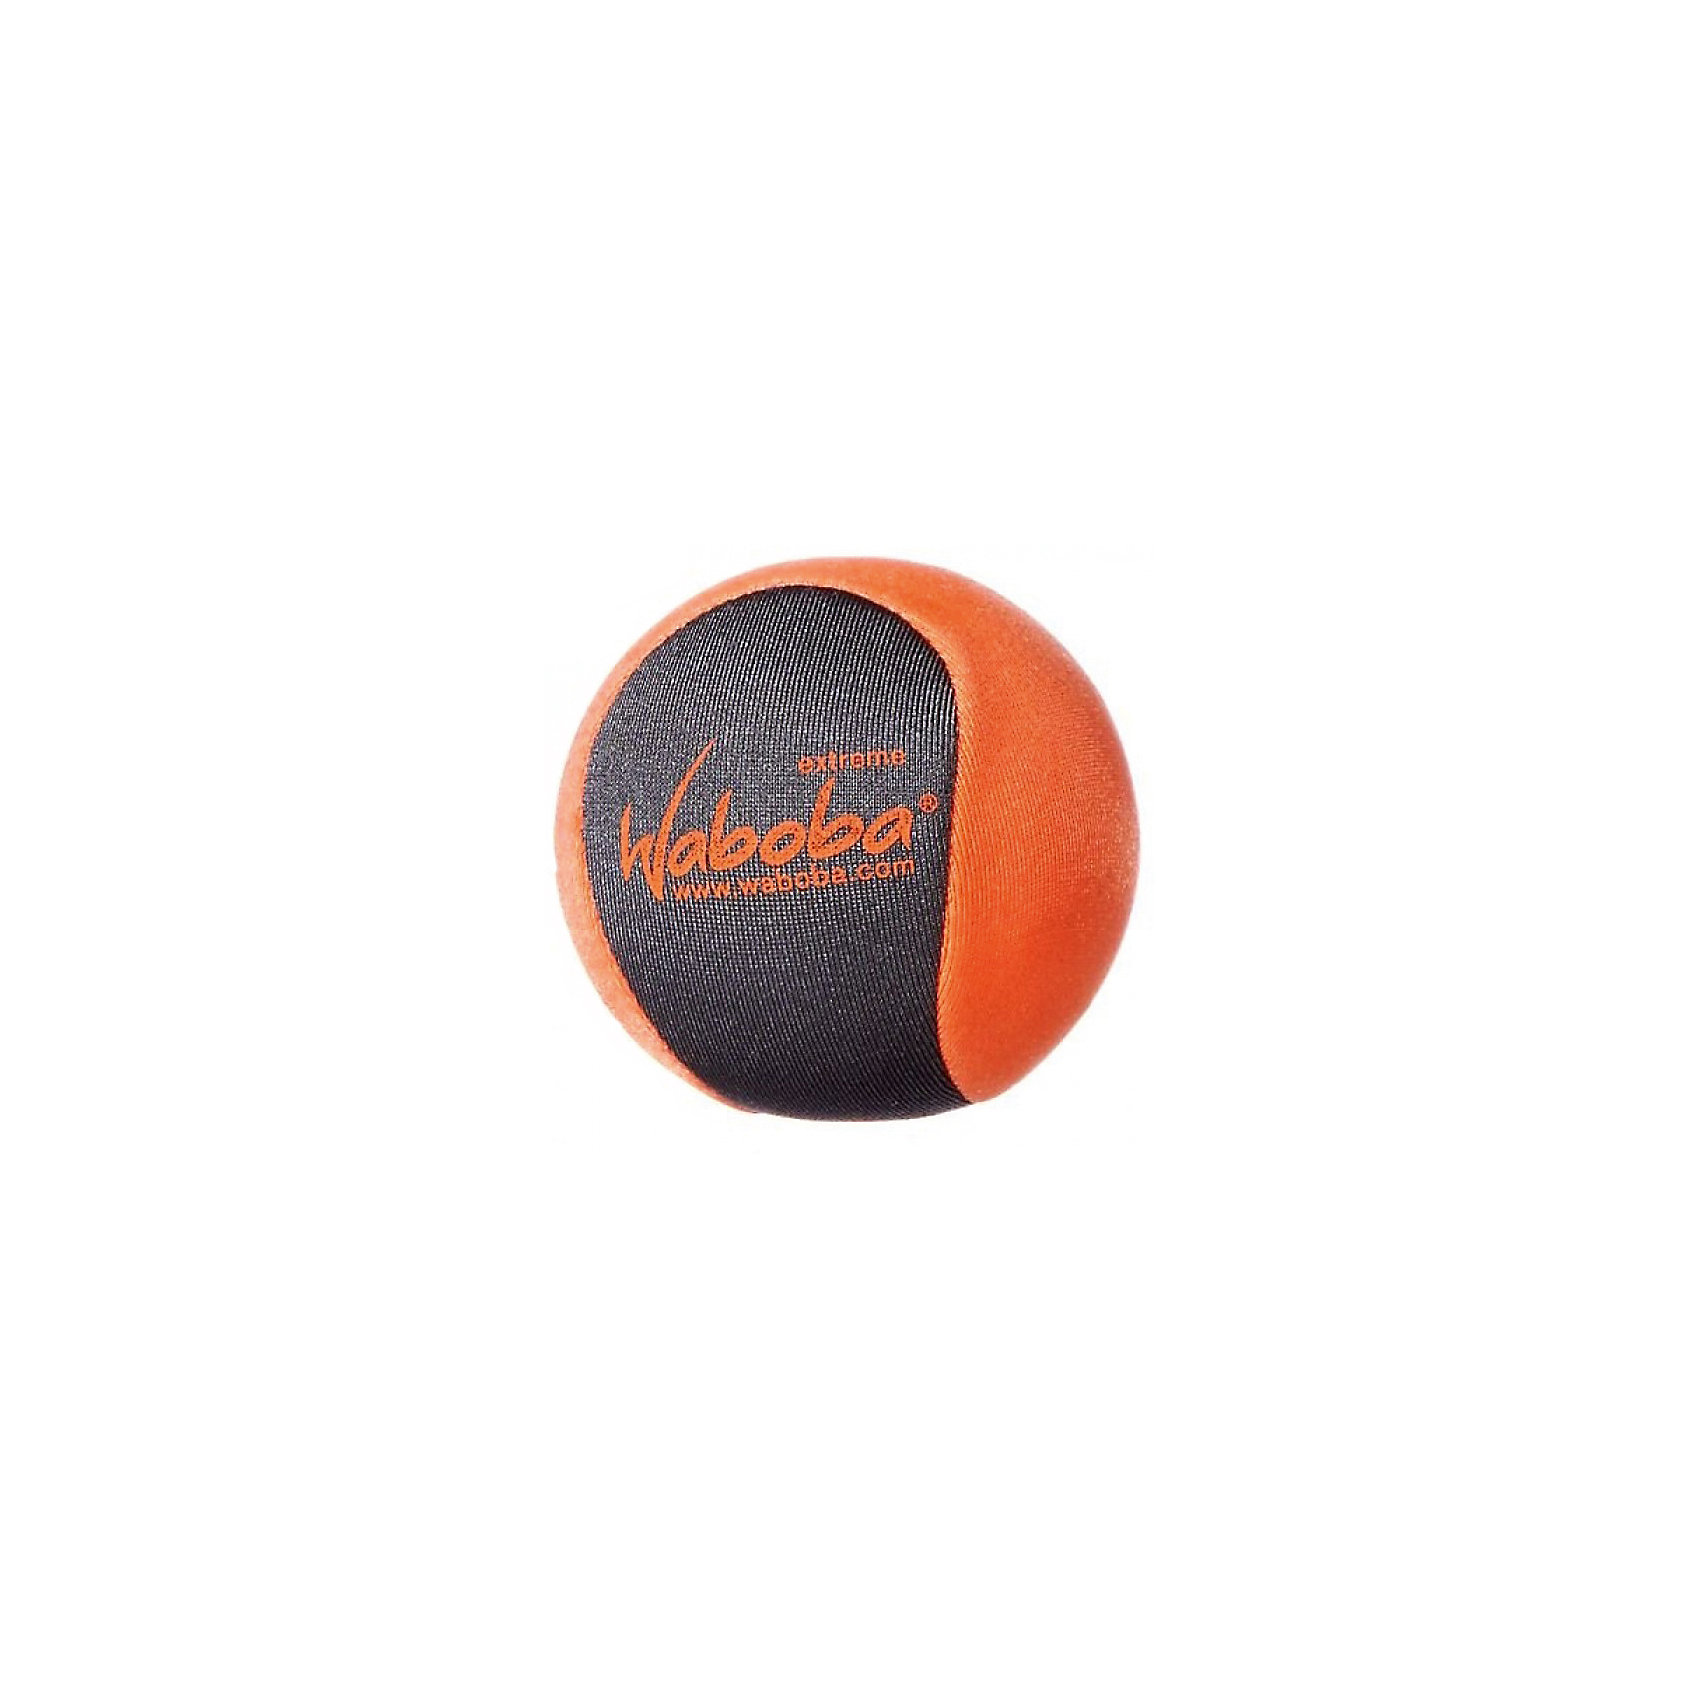 Мяч Waboba Ball Extreme, Waboba